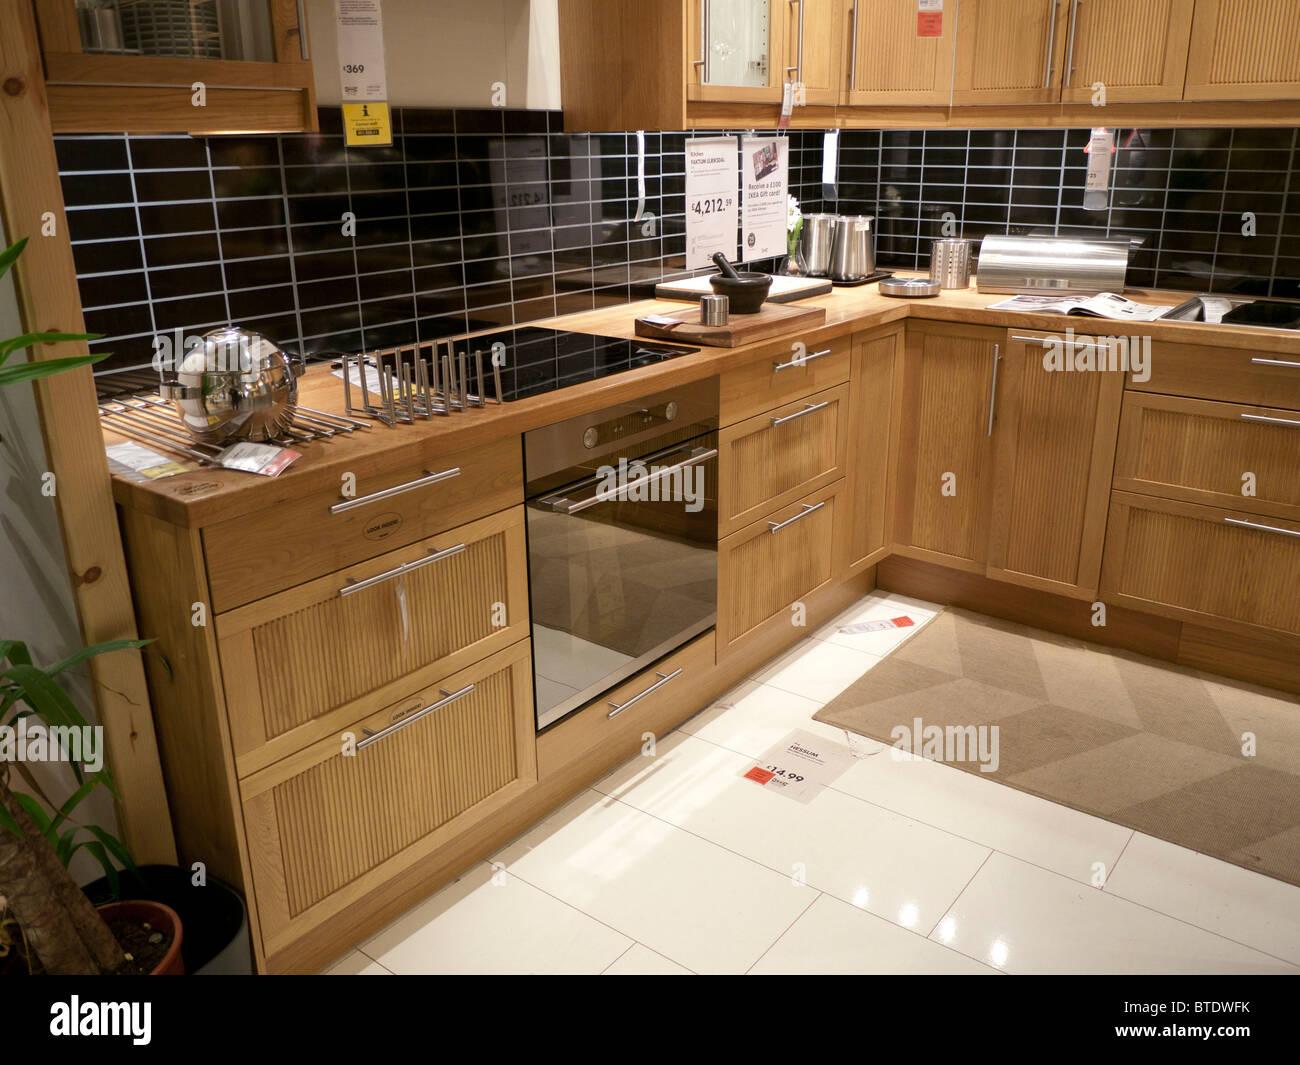 ikea küche ikea stockfoto, bild: 32267527 - alamy